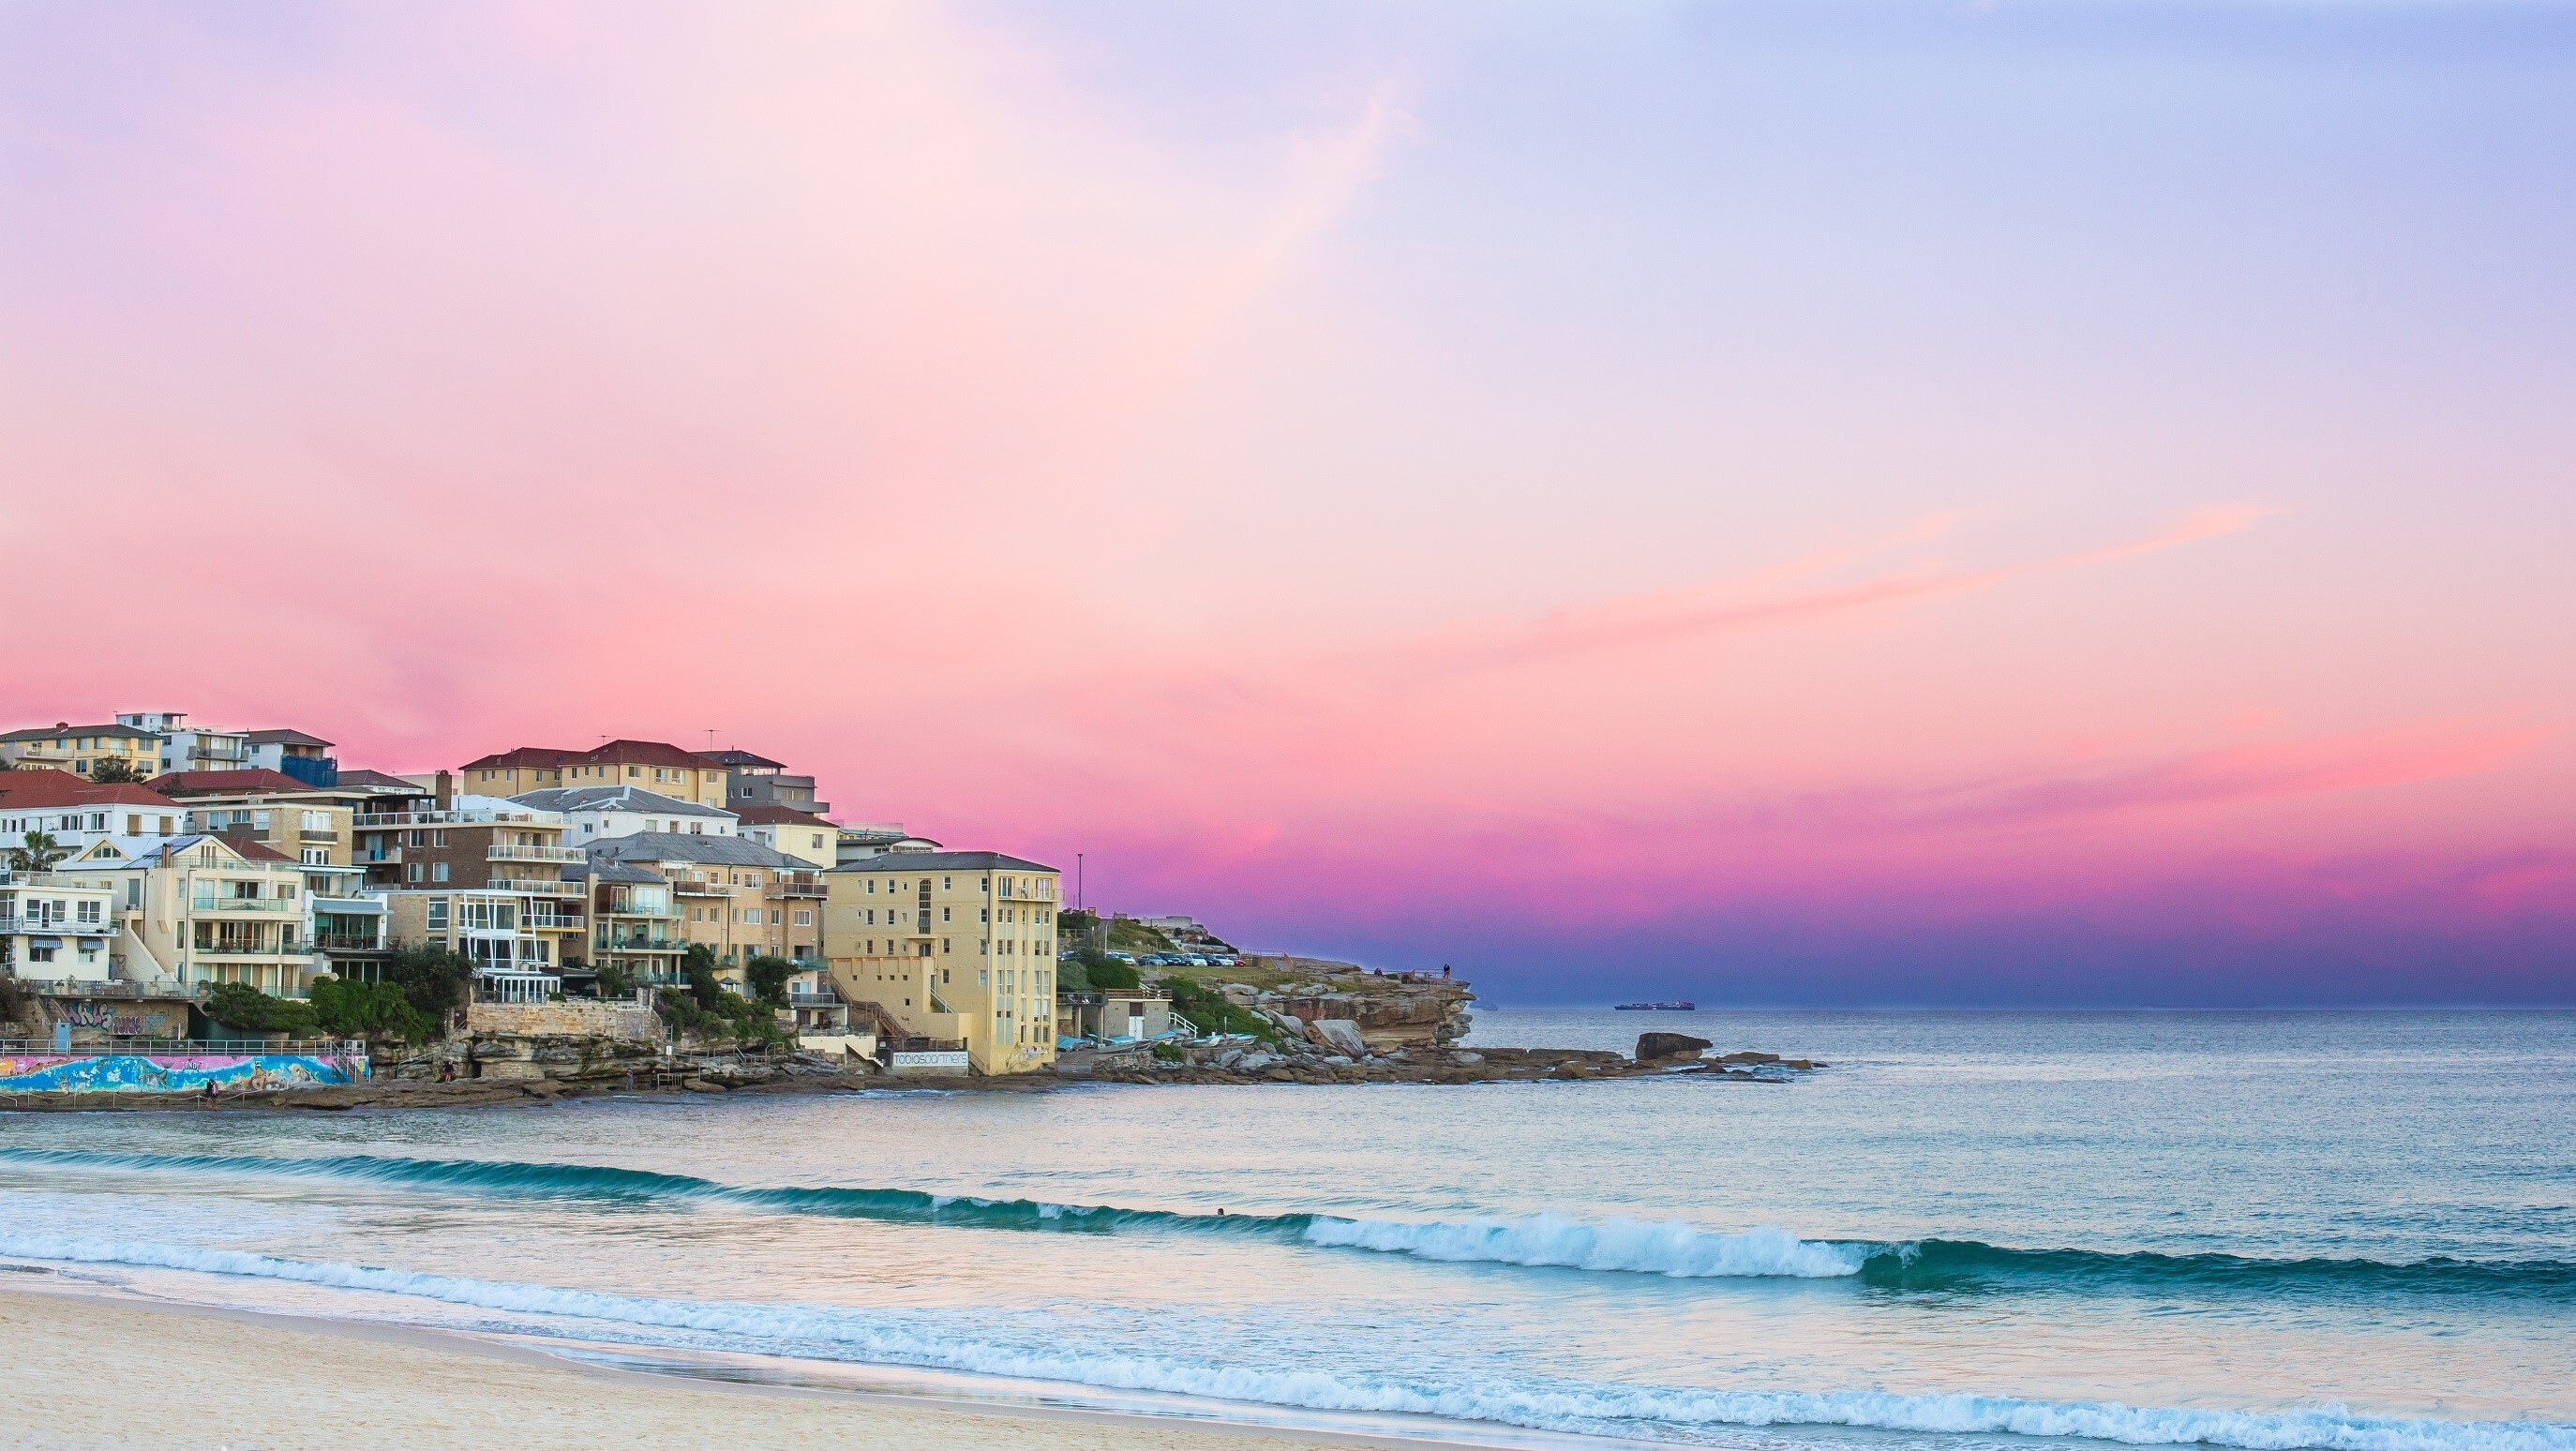 Beautiful Bondi Beach in Australia 2018 Travel HD Wallpaper | HD Wallpapers